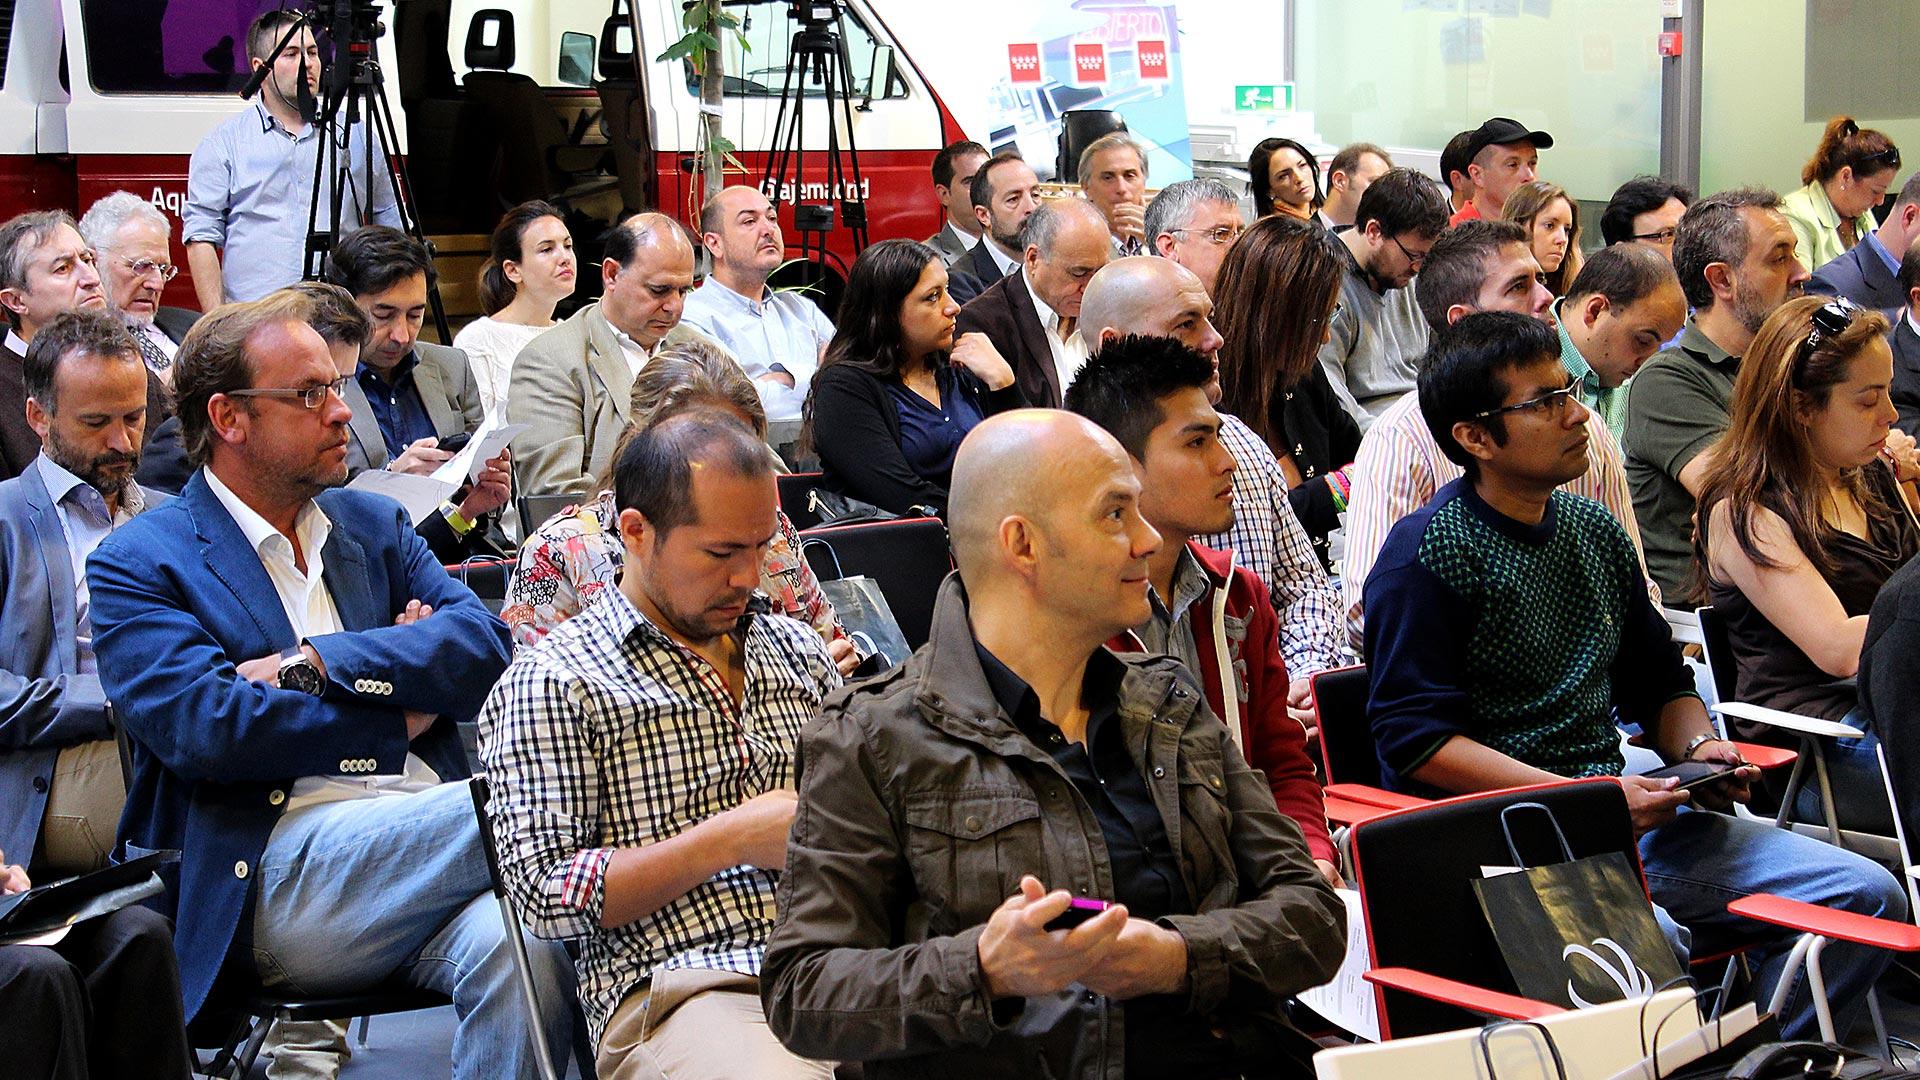 tpnet-eventos-encuentros-profesionales-iot-publico-1